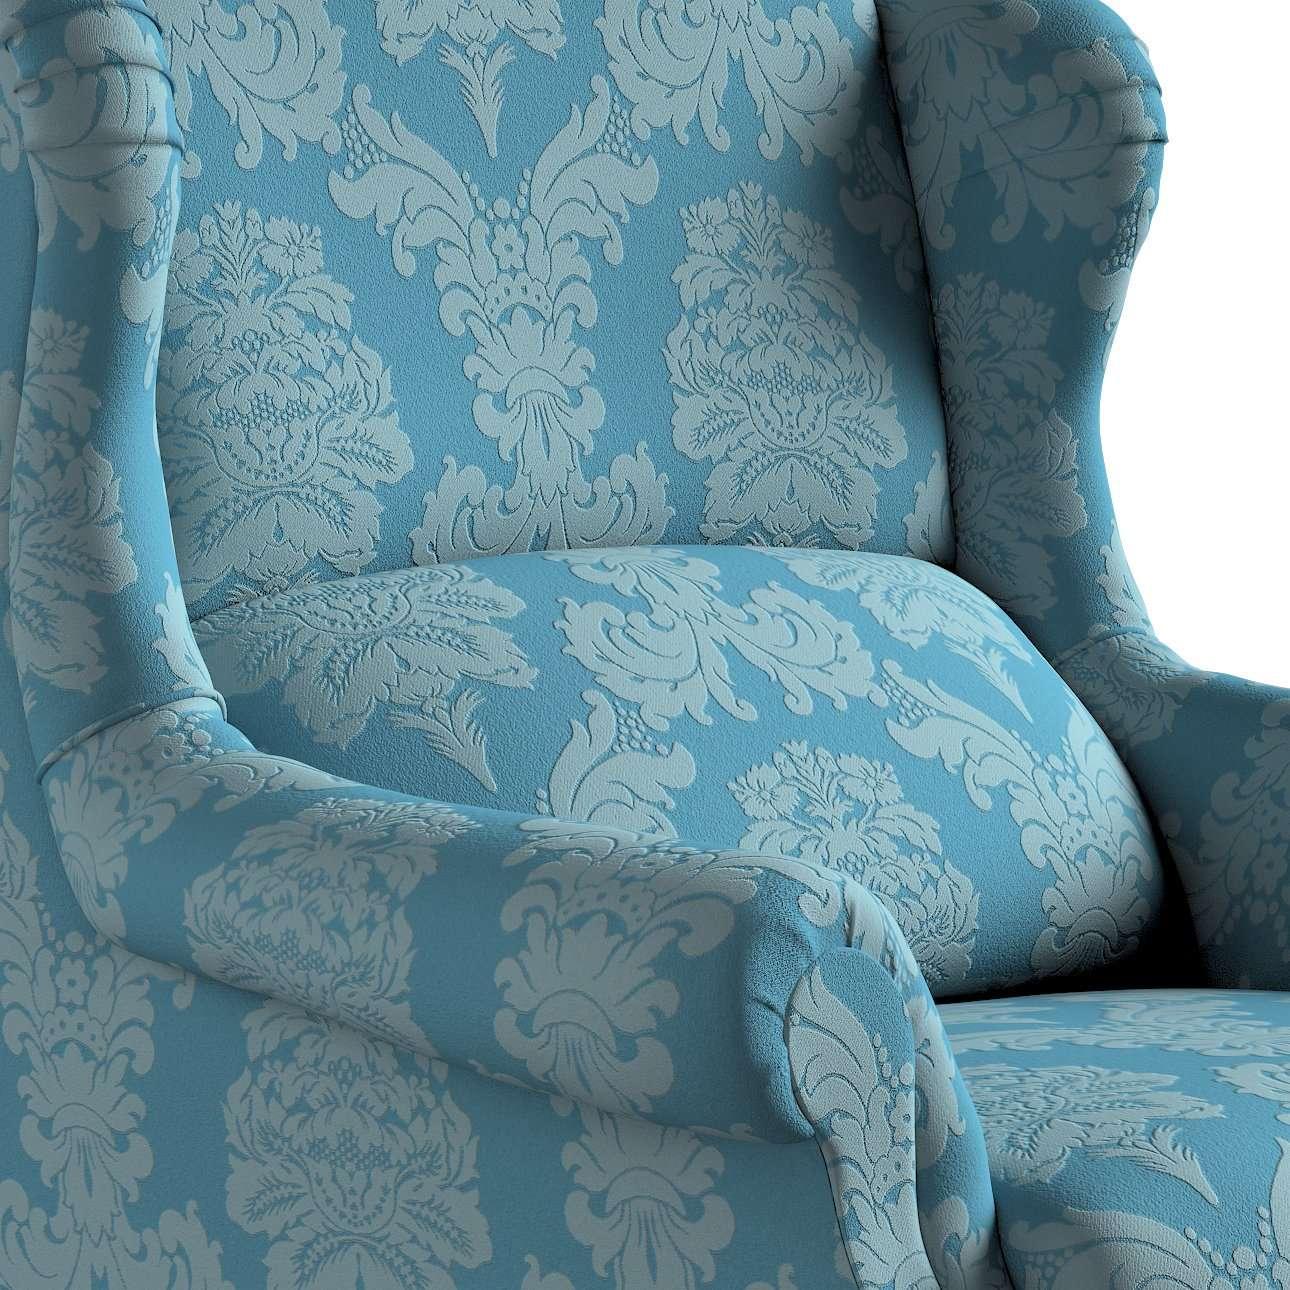 Fotel Unique w kolekcji Damasco, tkanina: 613-67